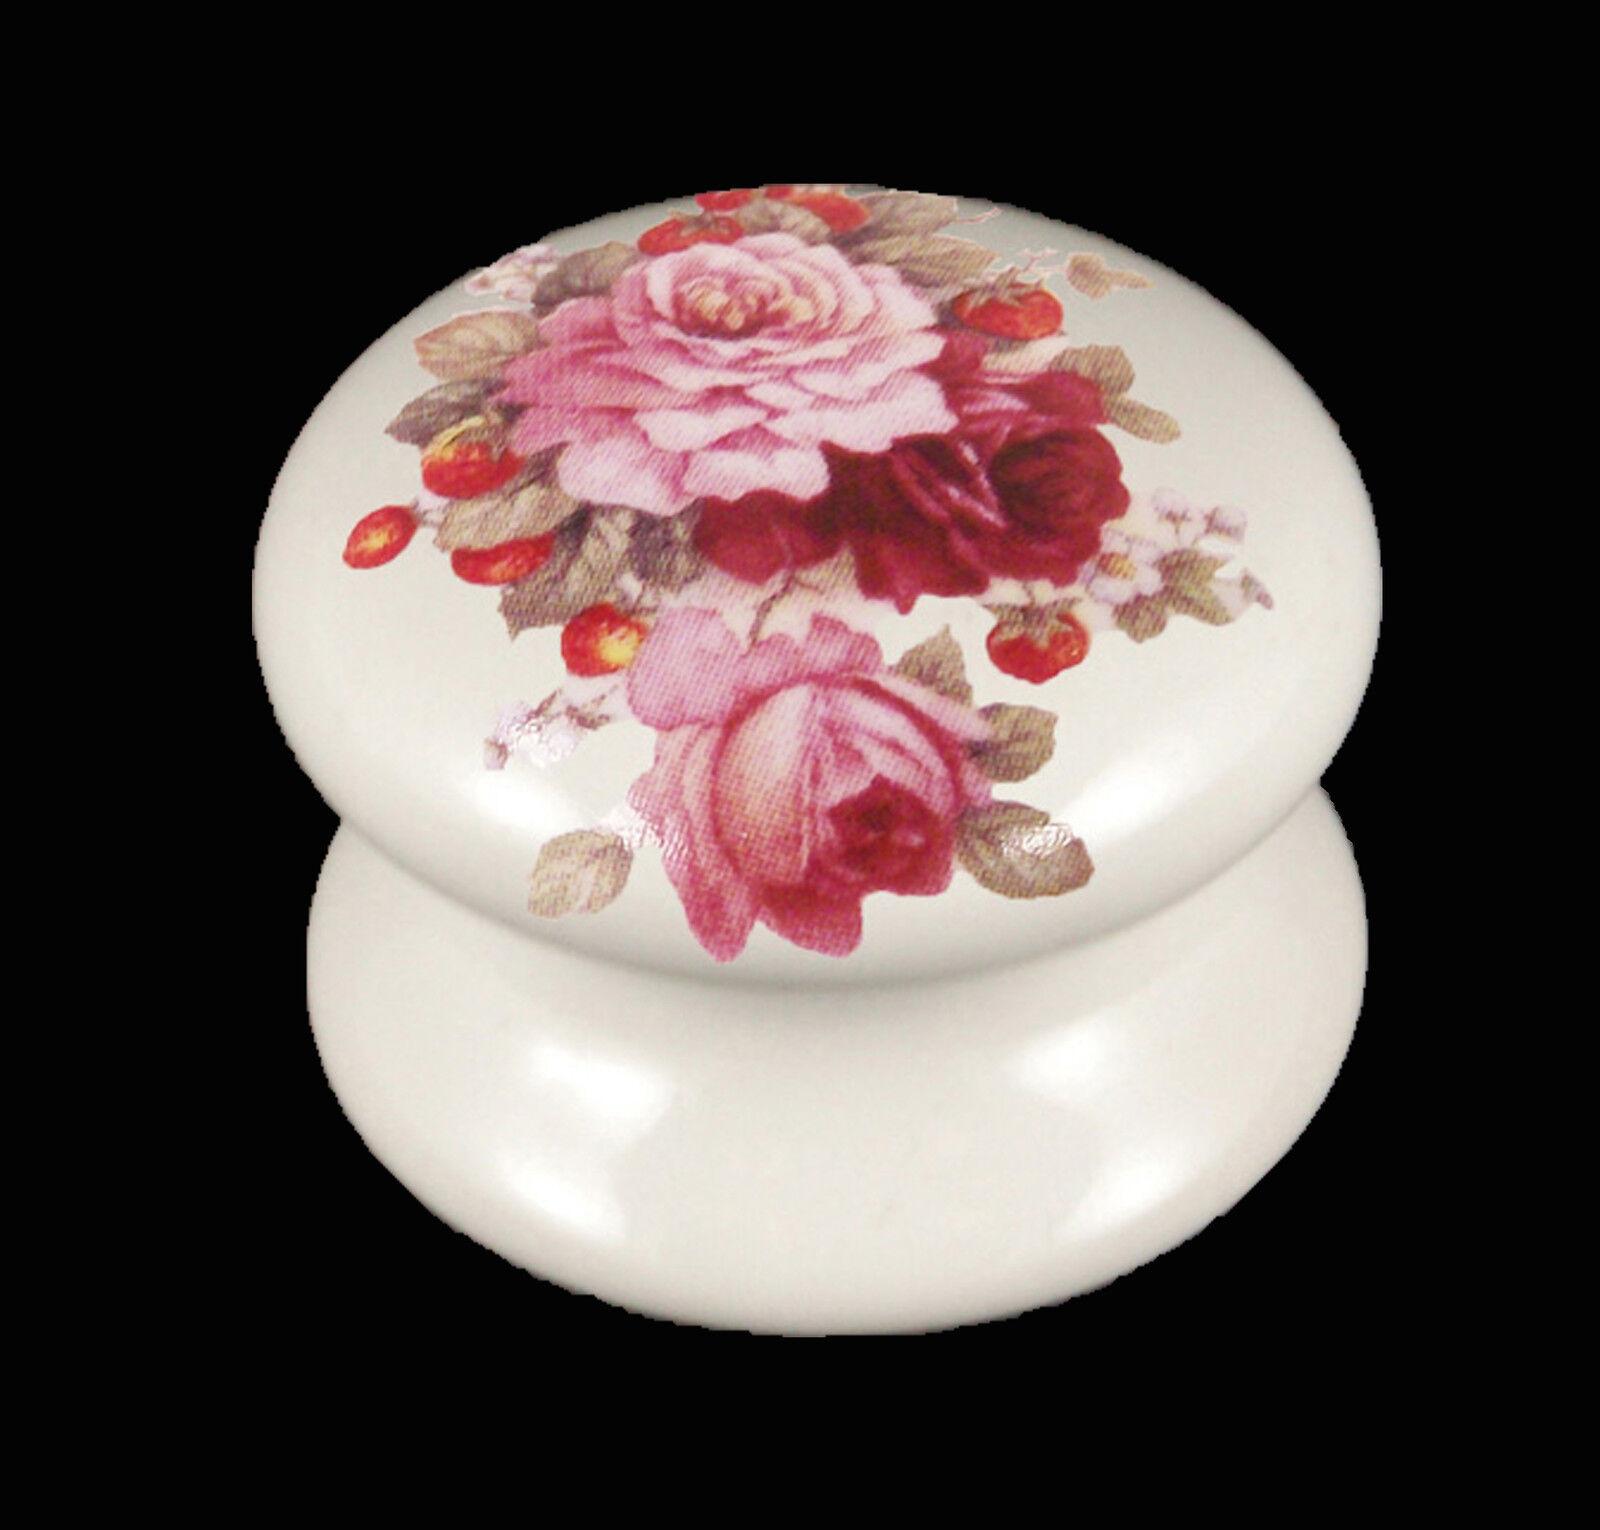 Weiß Victorian Cupboard Ceramic Door Knobs Strawberries and Cream Design